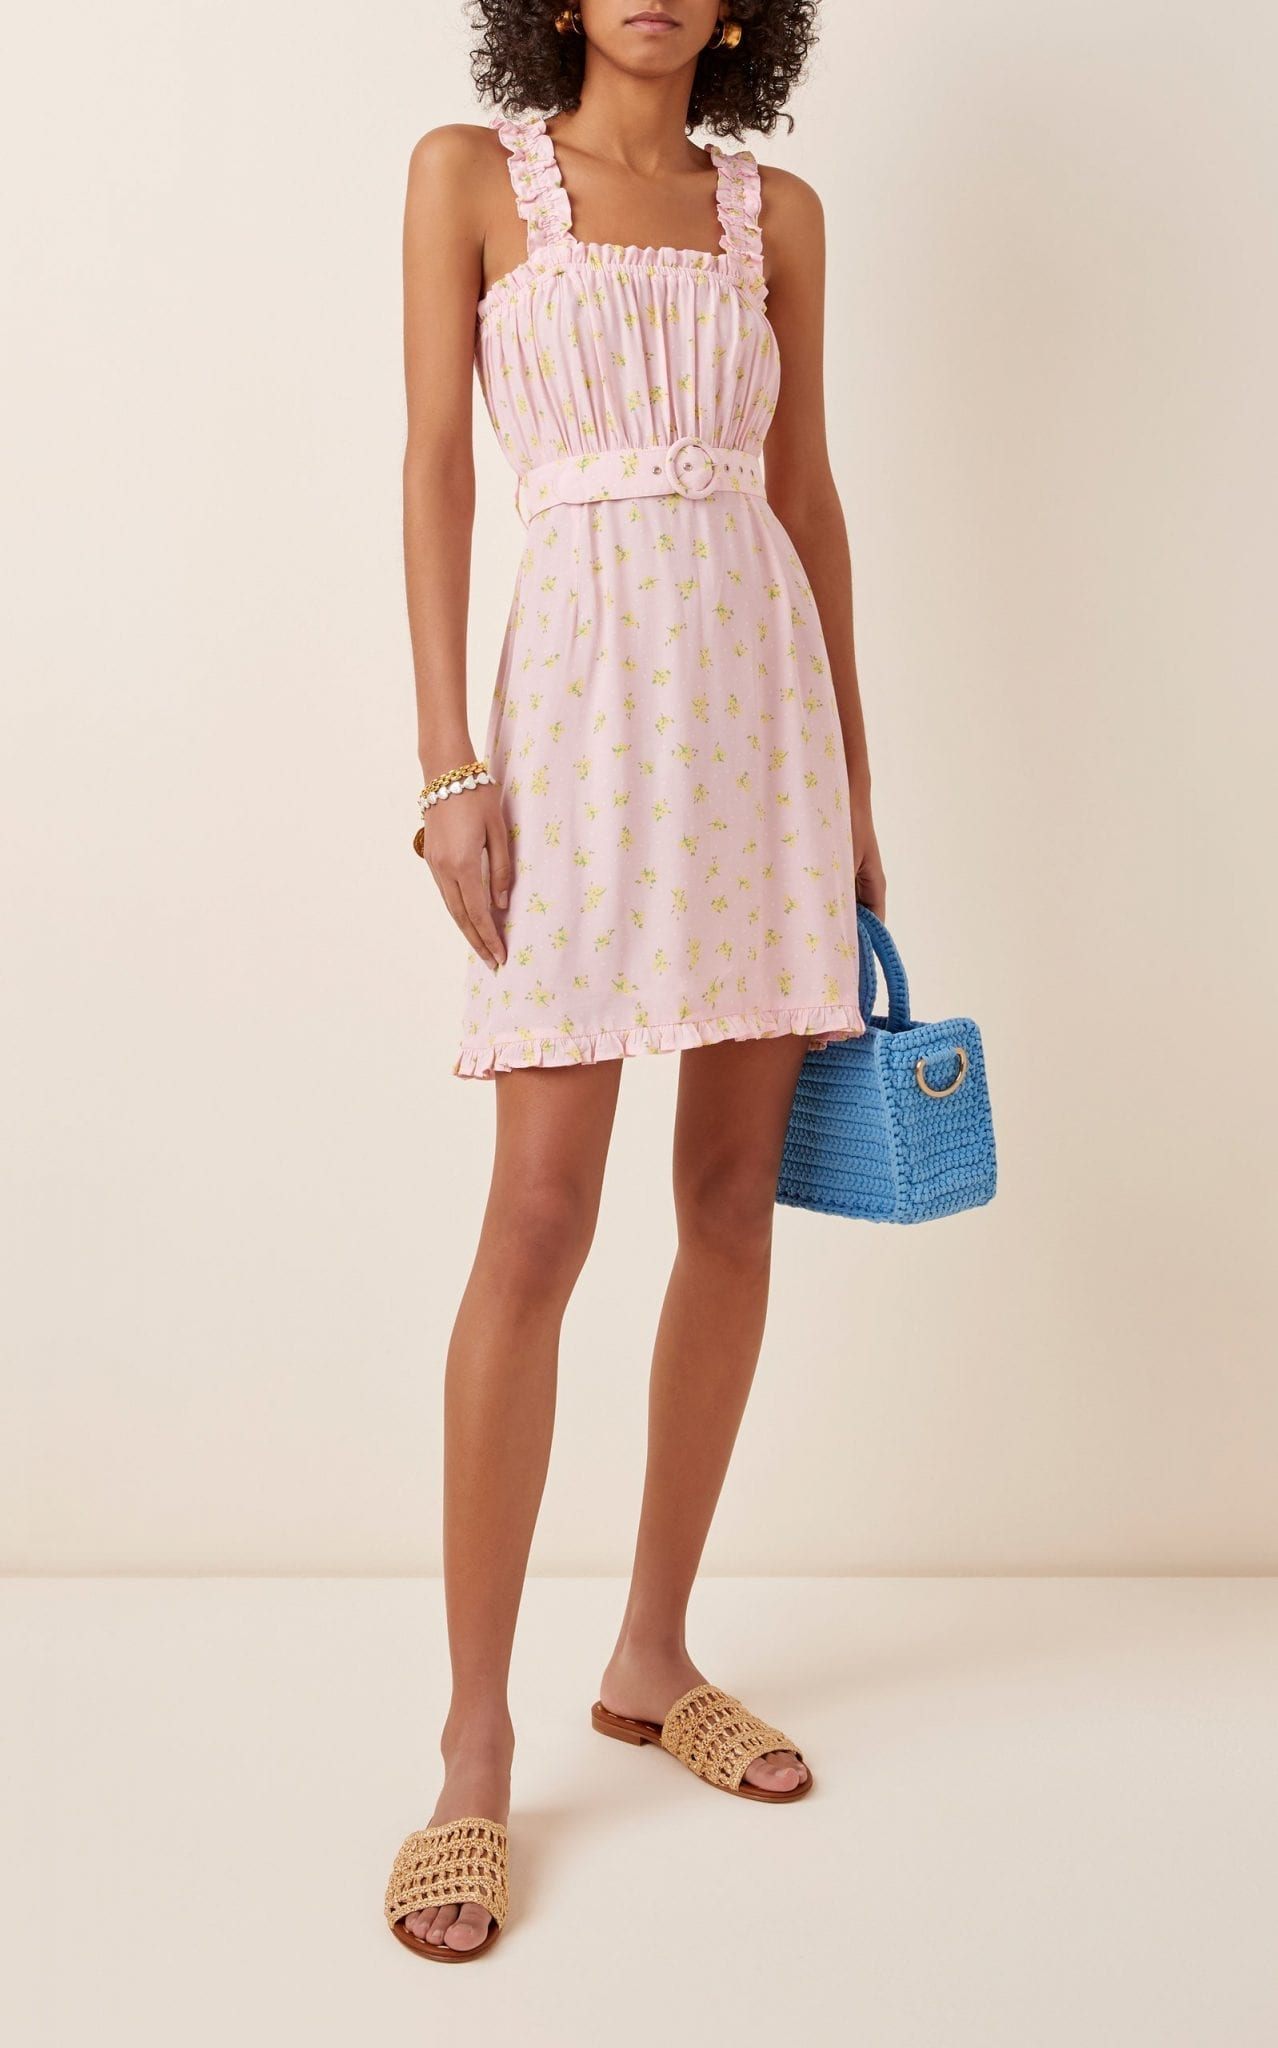 FAITHFULL THE BRAND Belted Ruffled Floral-Print Crepe Mini Dress